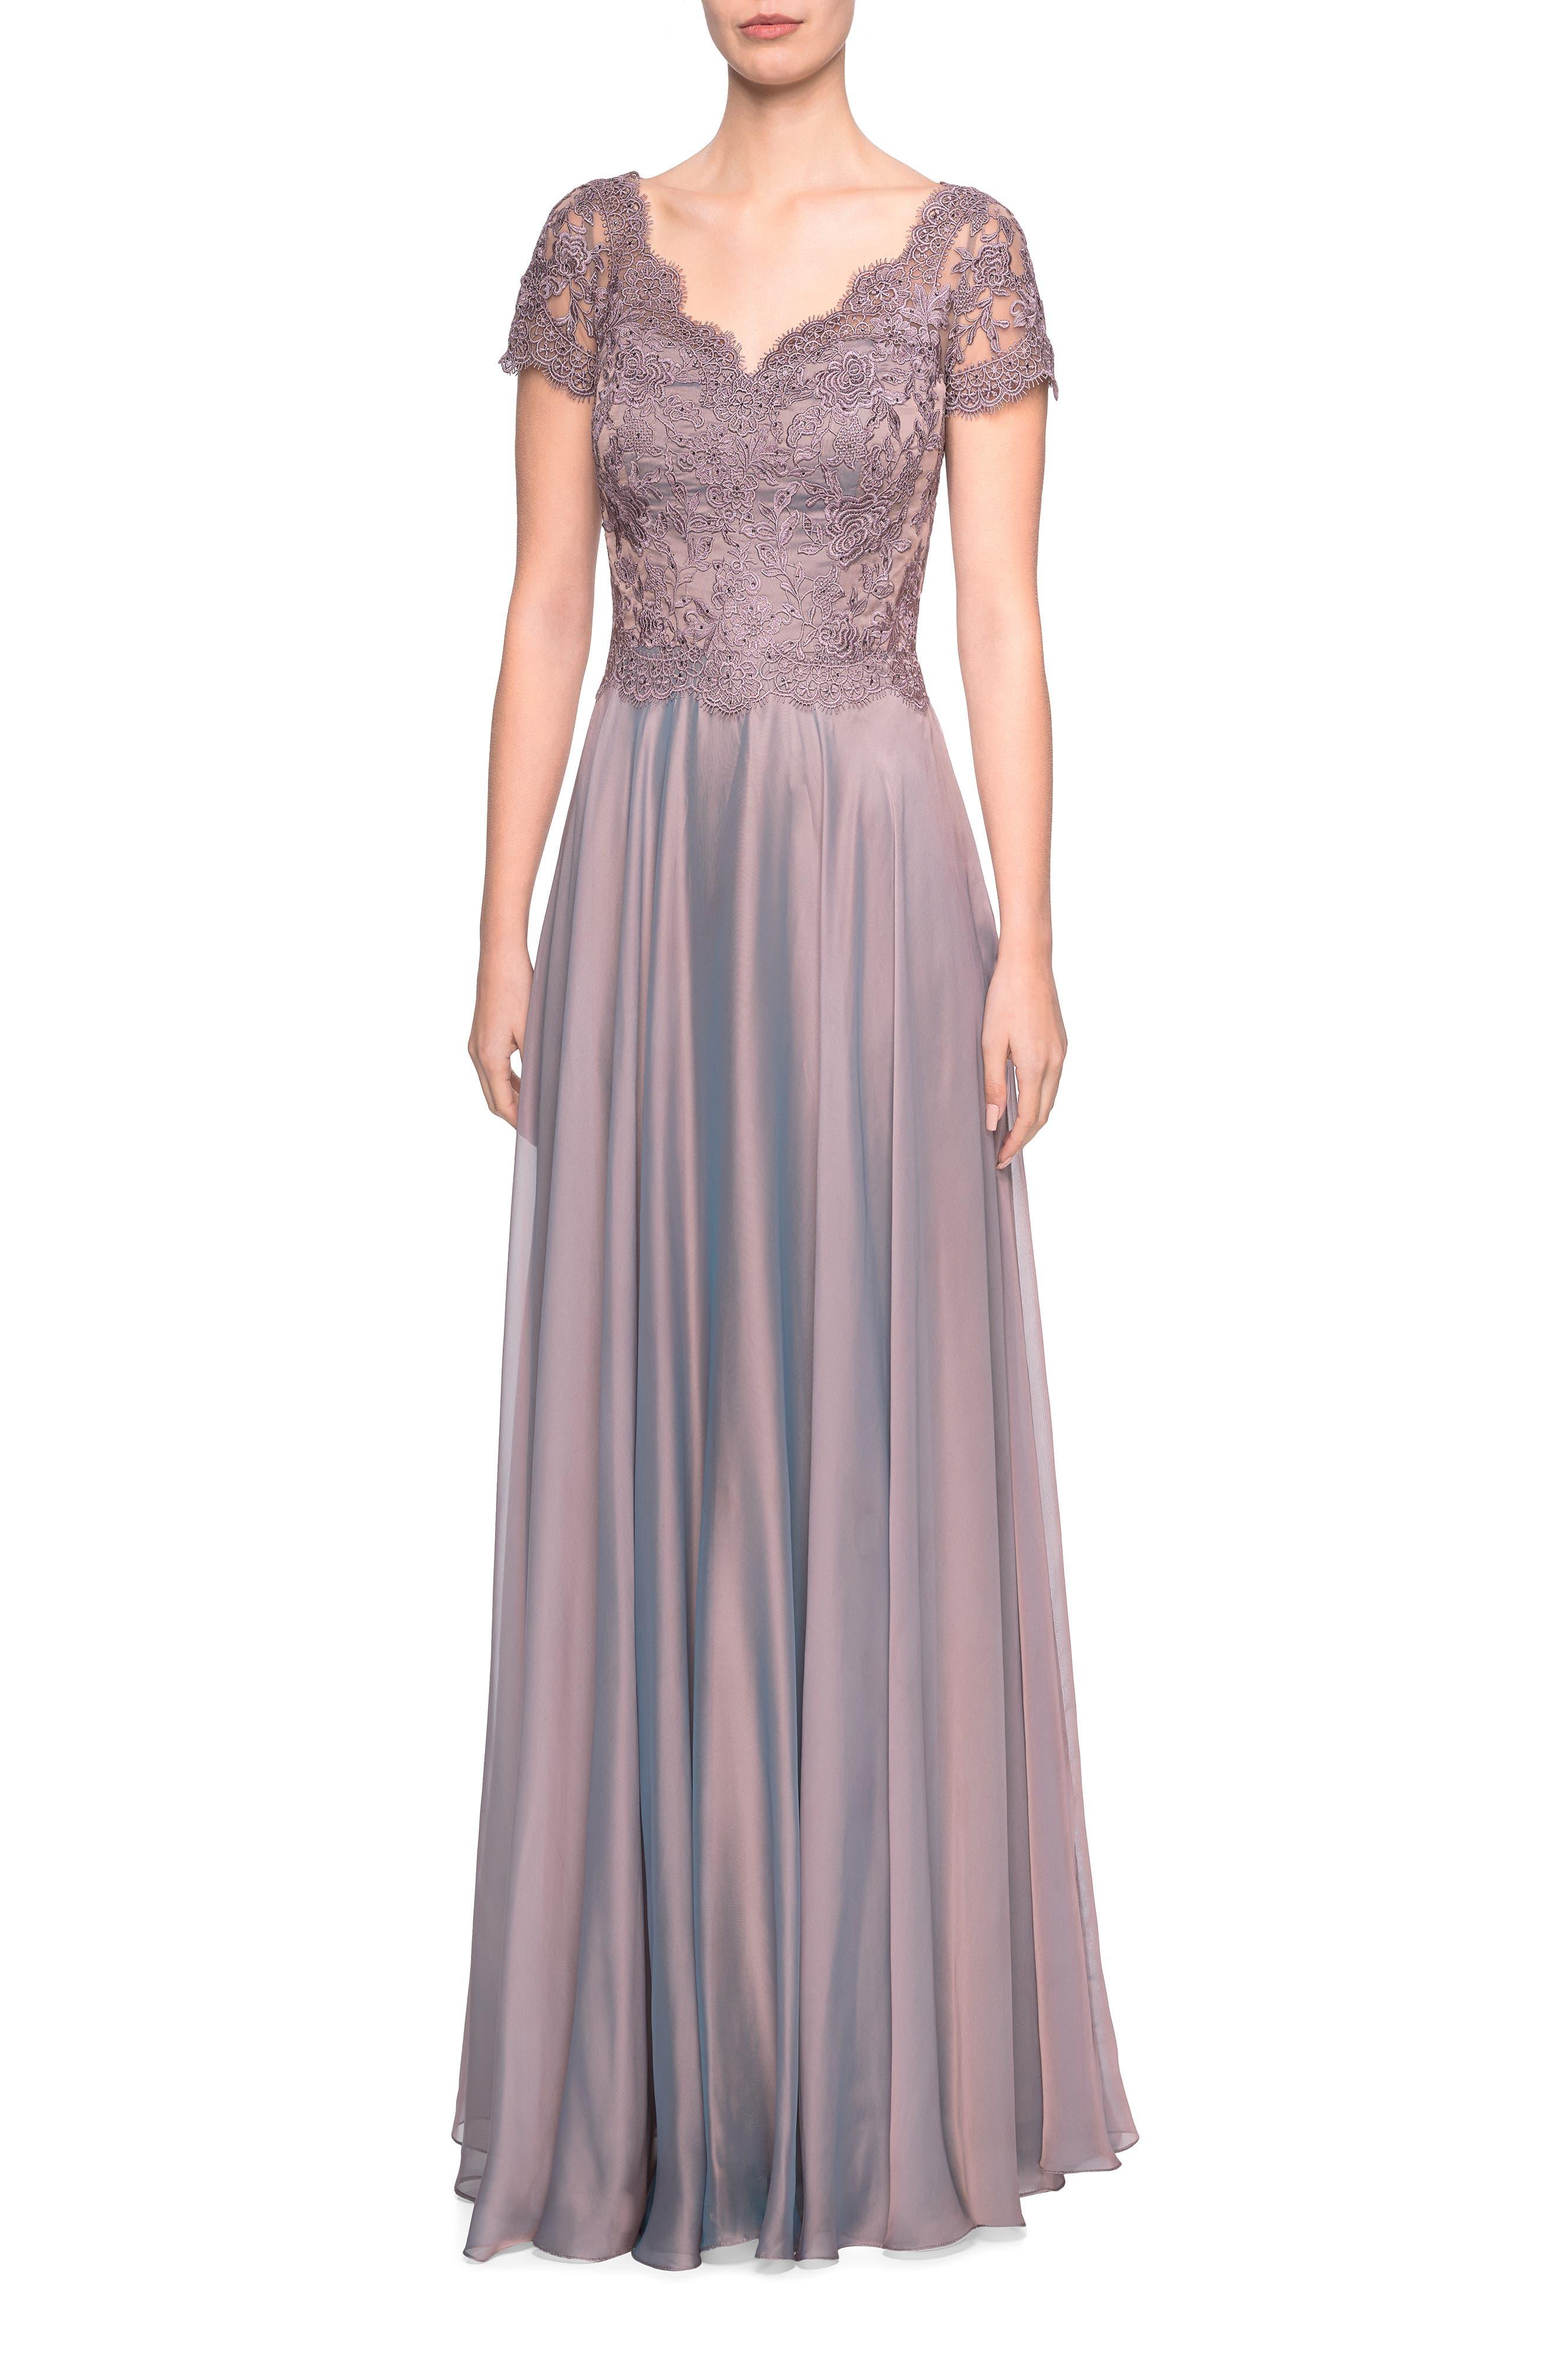 LA FEMME Embroidered Lace & Chiffon Evening Dress, Main, color, COCOA